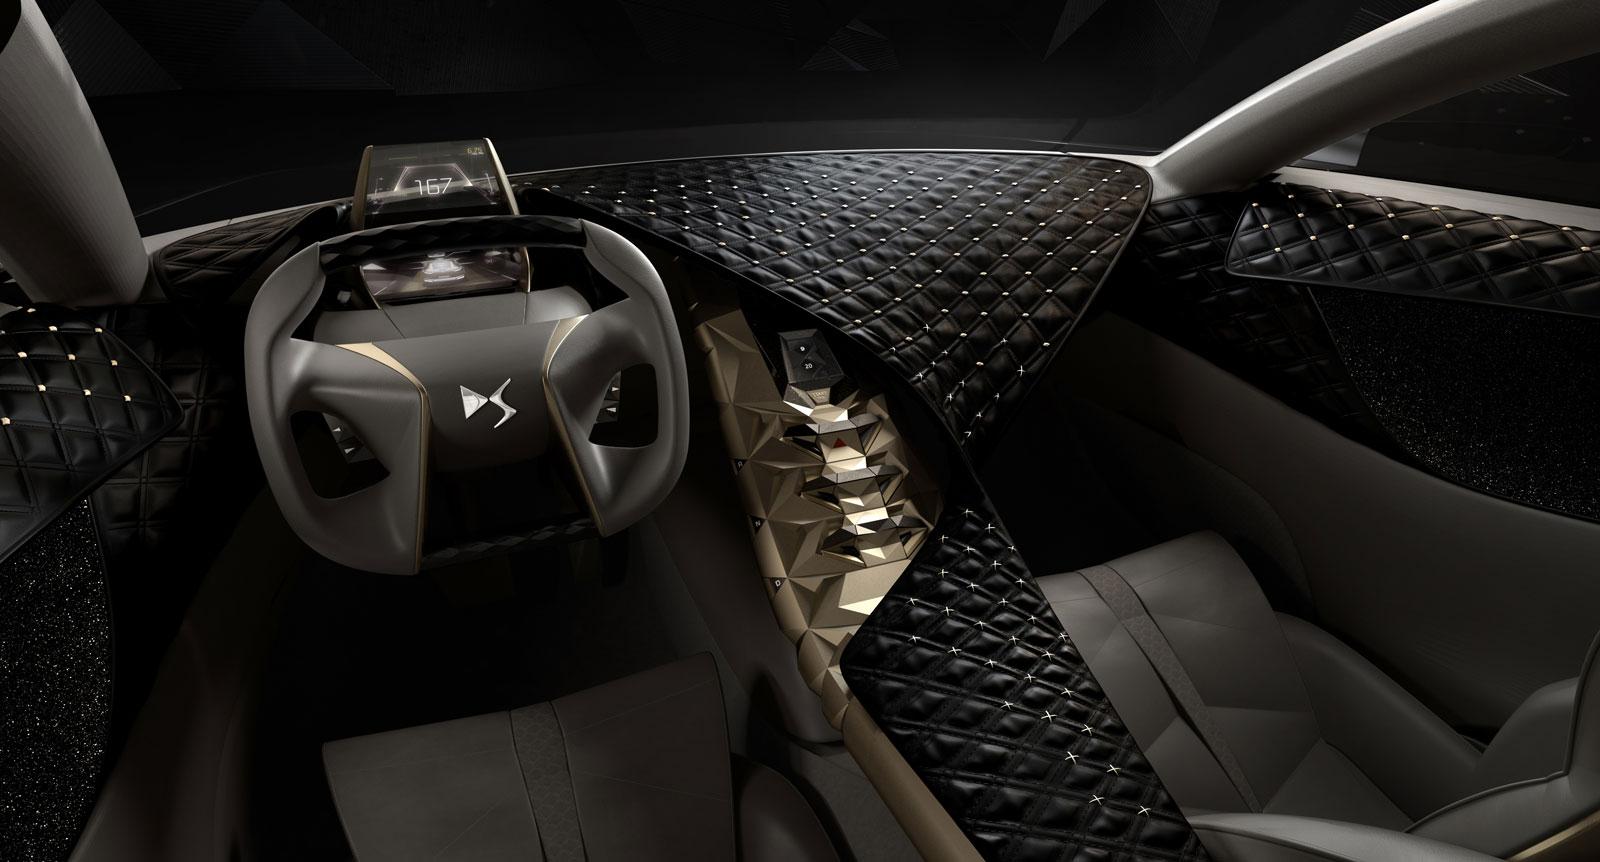 citro n presents the divine ds concept car body design. Black Bedroom Furniture Sets. Home Design Ideas